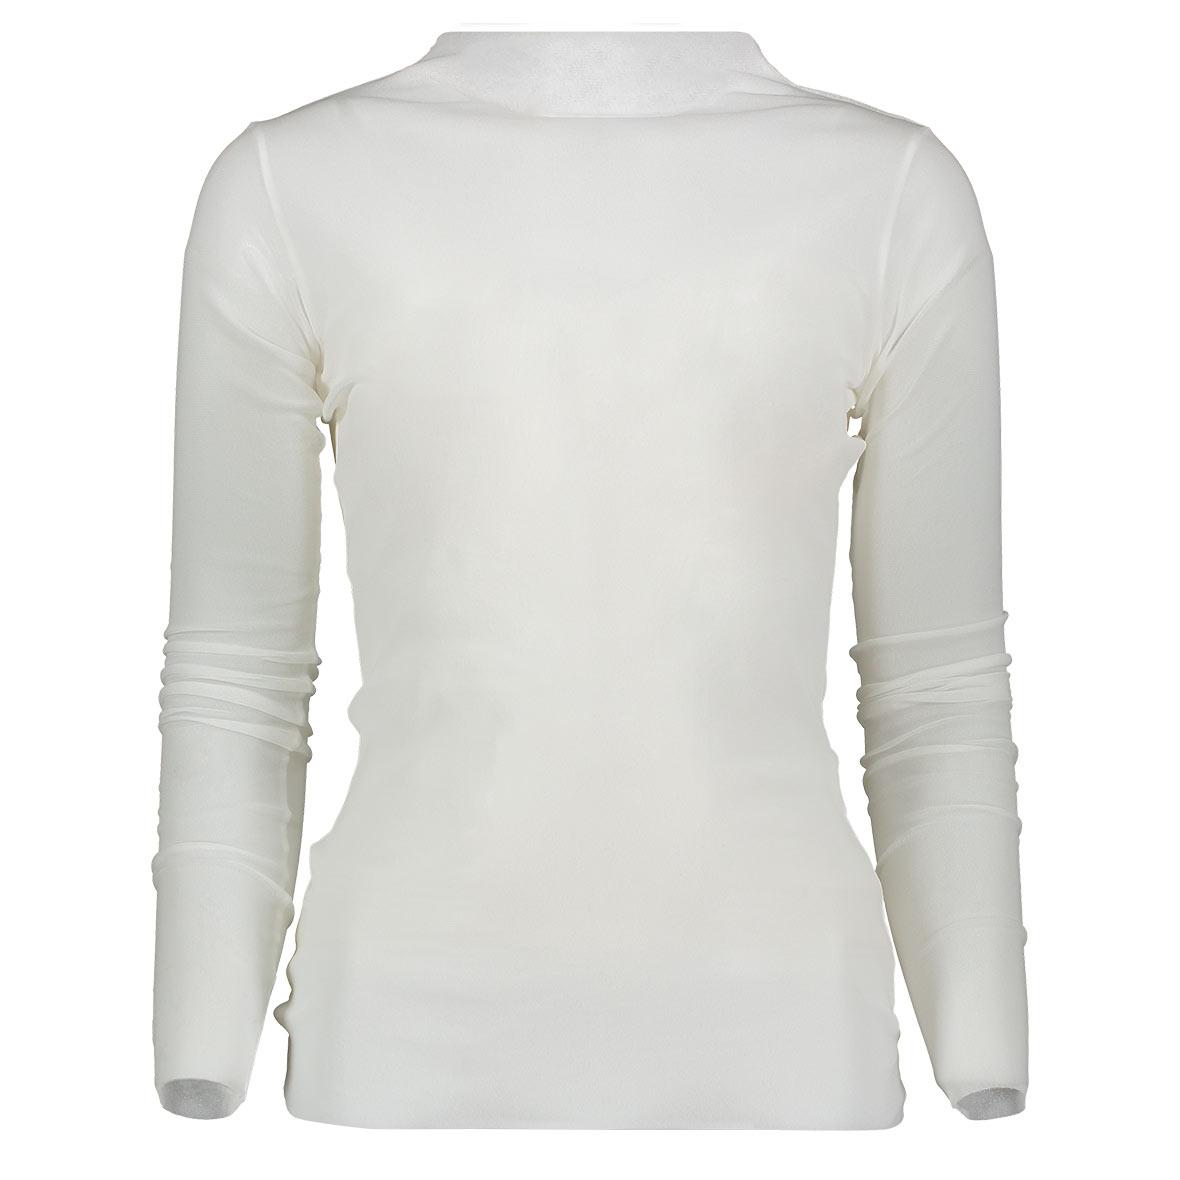 neva shirt offwhite paradis des innocents